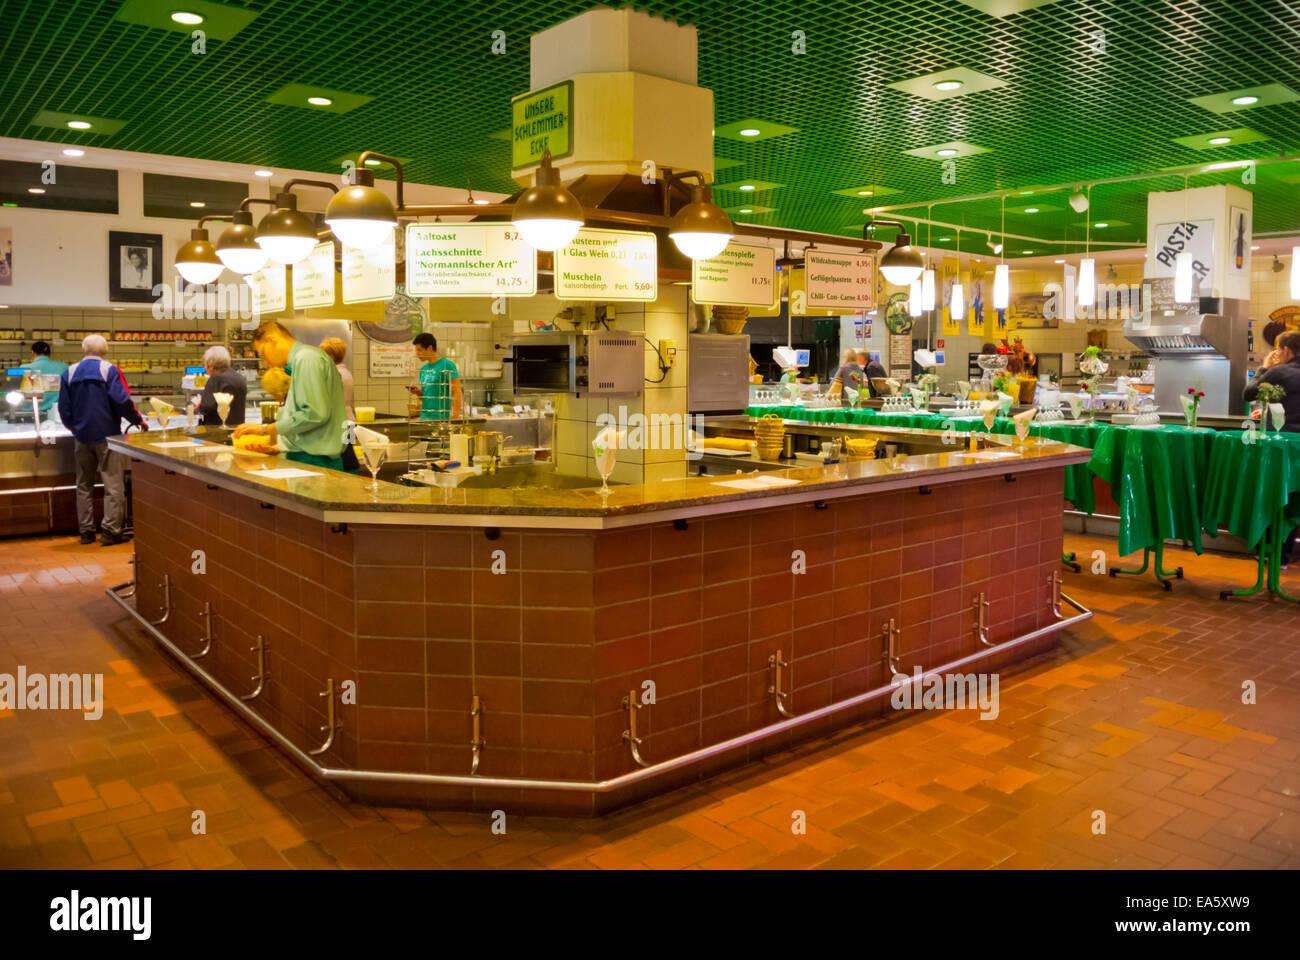 Rogacki Markt Halle Feinkost Restaurant, Charlottenburg, West-Berlin, Deutschland Stockbild